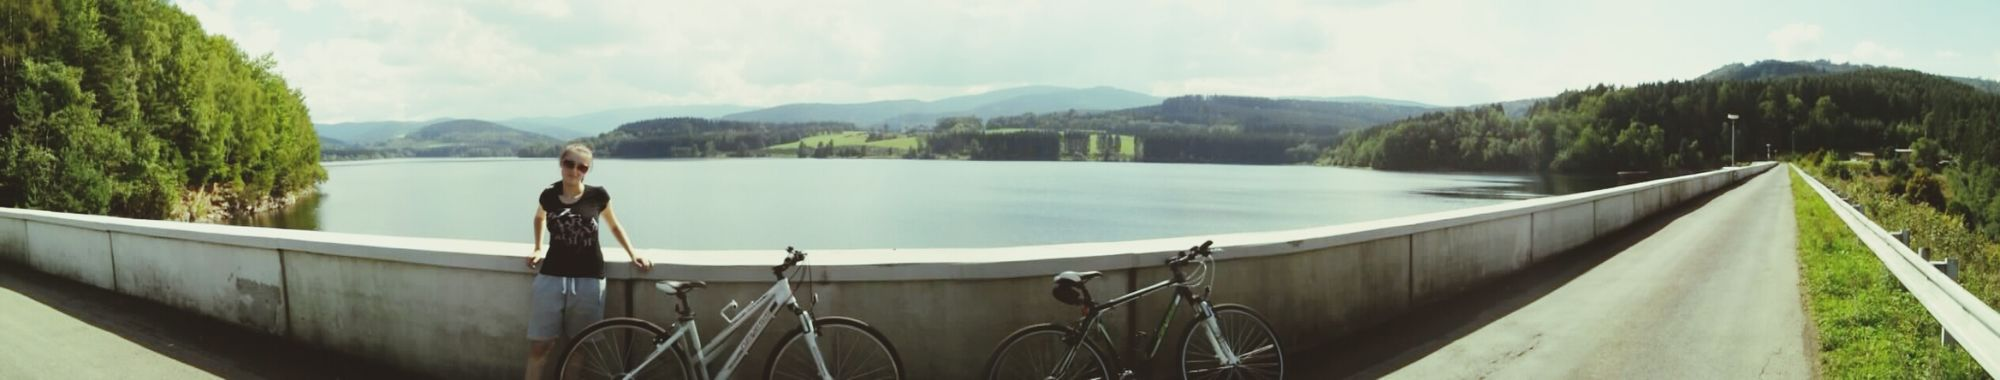 Girlfriend Cycling Nicetime